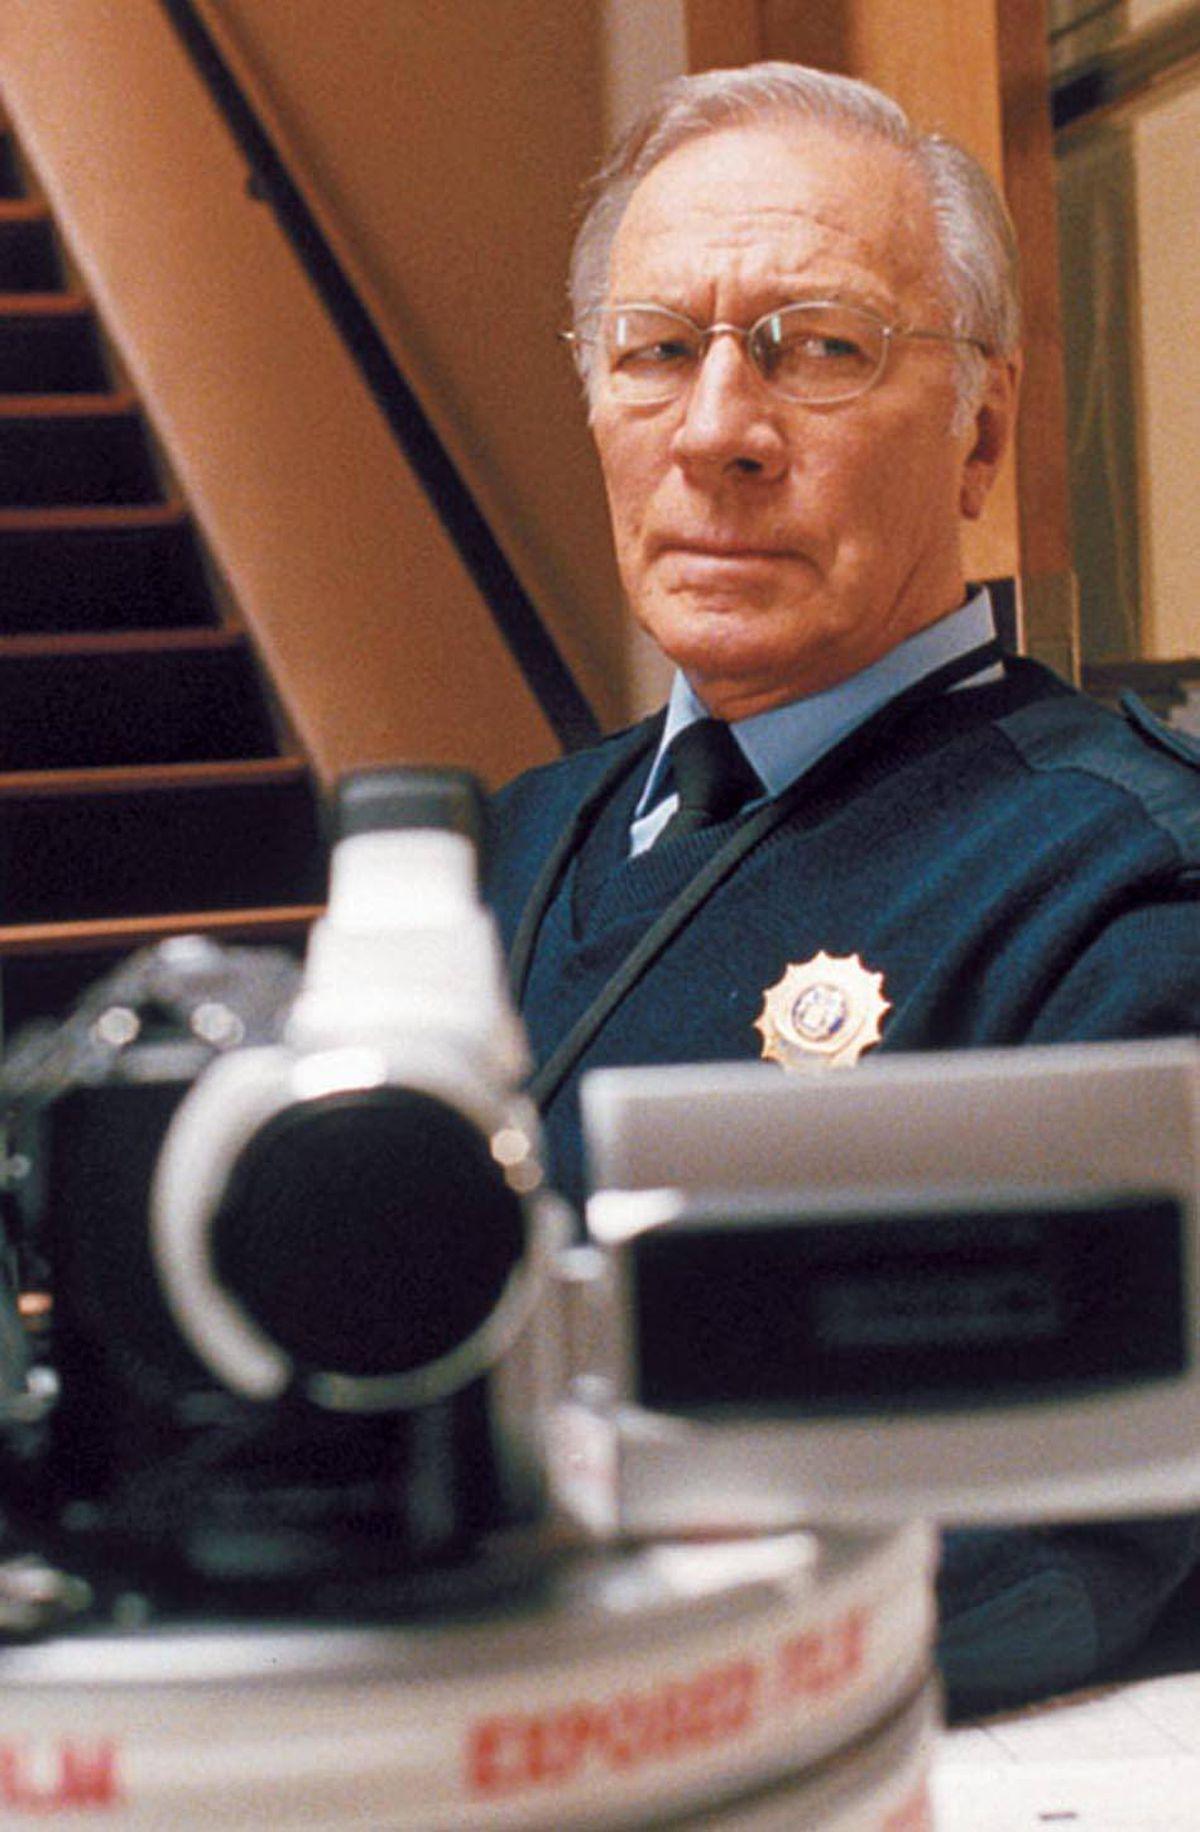 Christopher Plummer in Atom Egoyan's Ararat (2002).